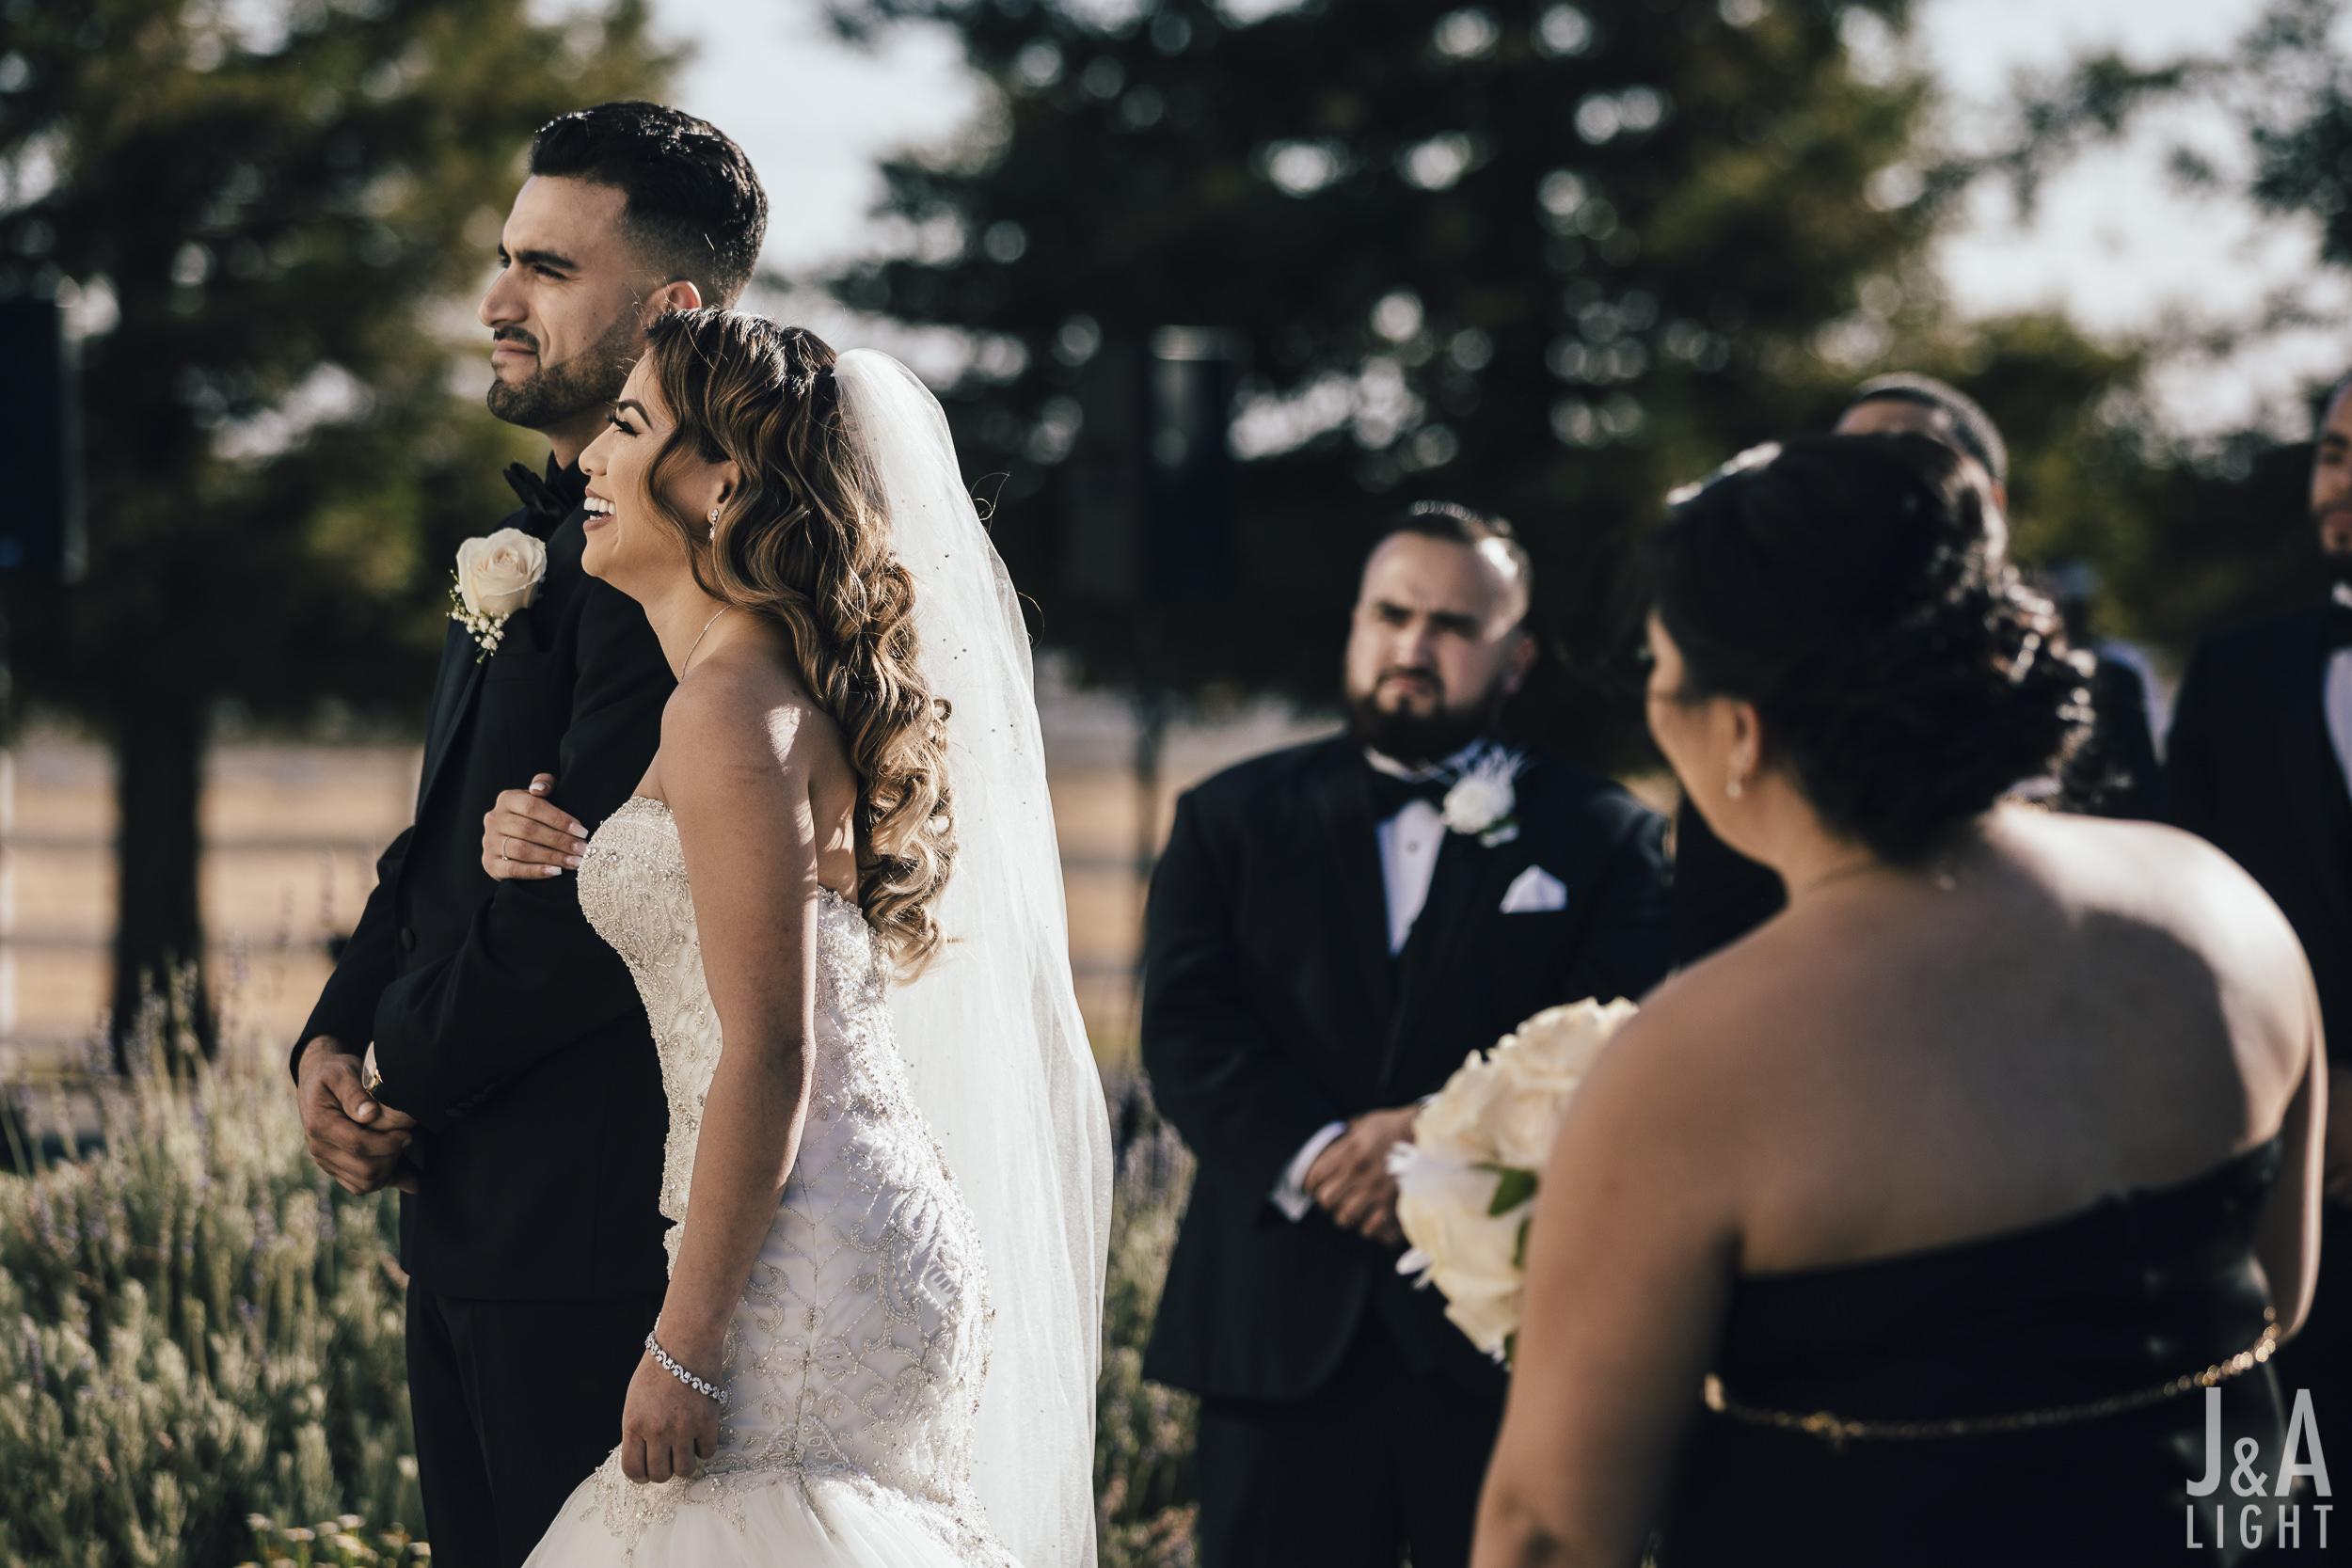 20171014-JanDan-LosBanos-GlassMansion-Wedding-Blog-037.jpg